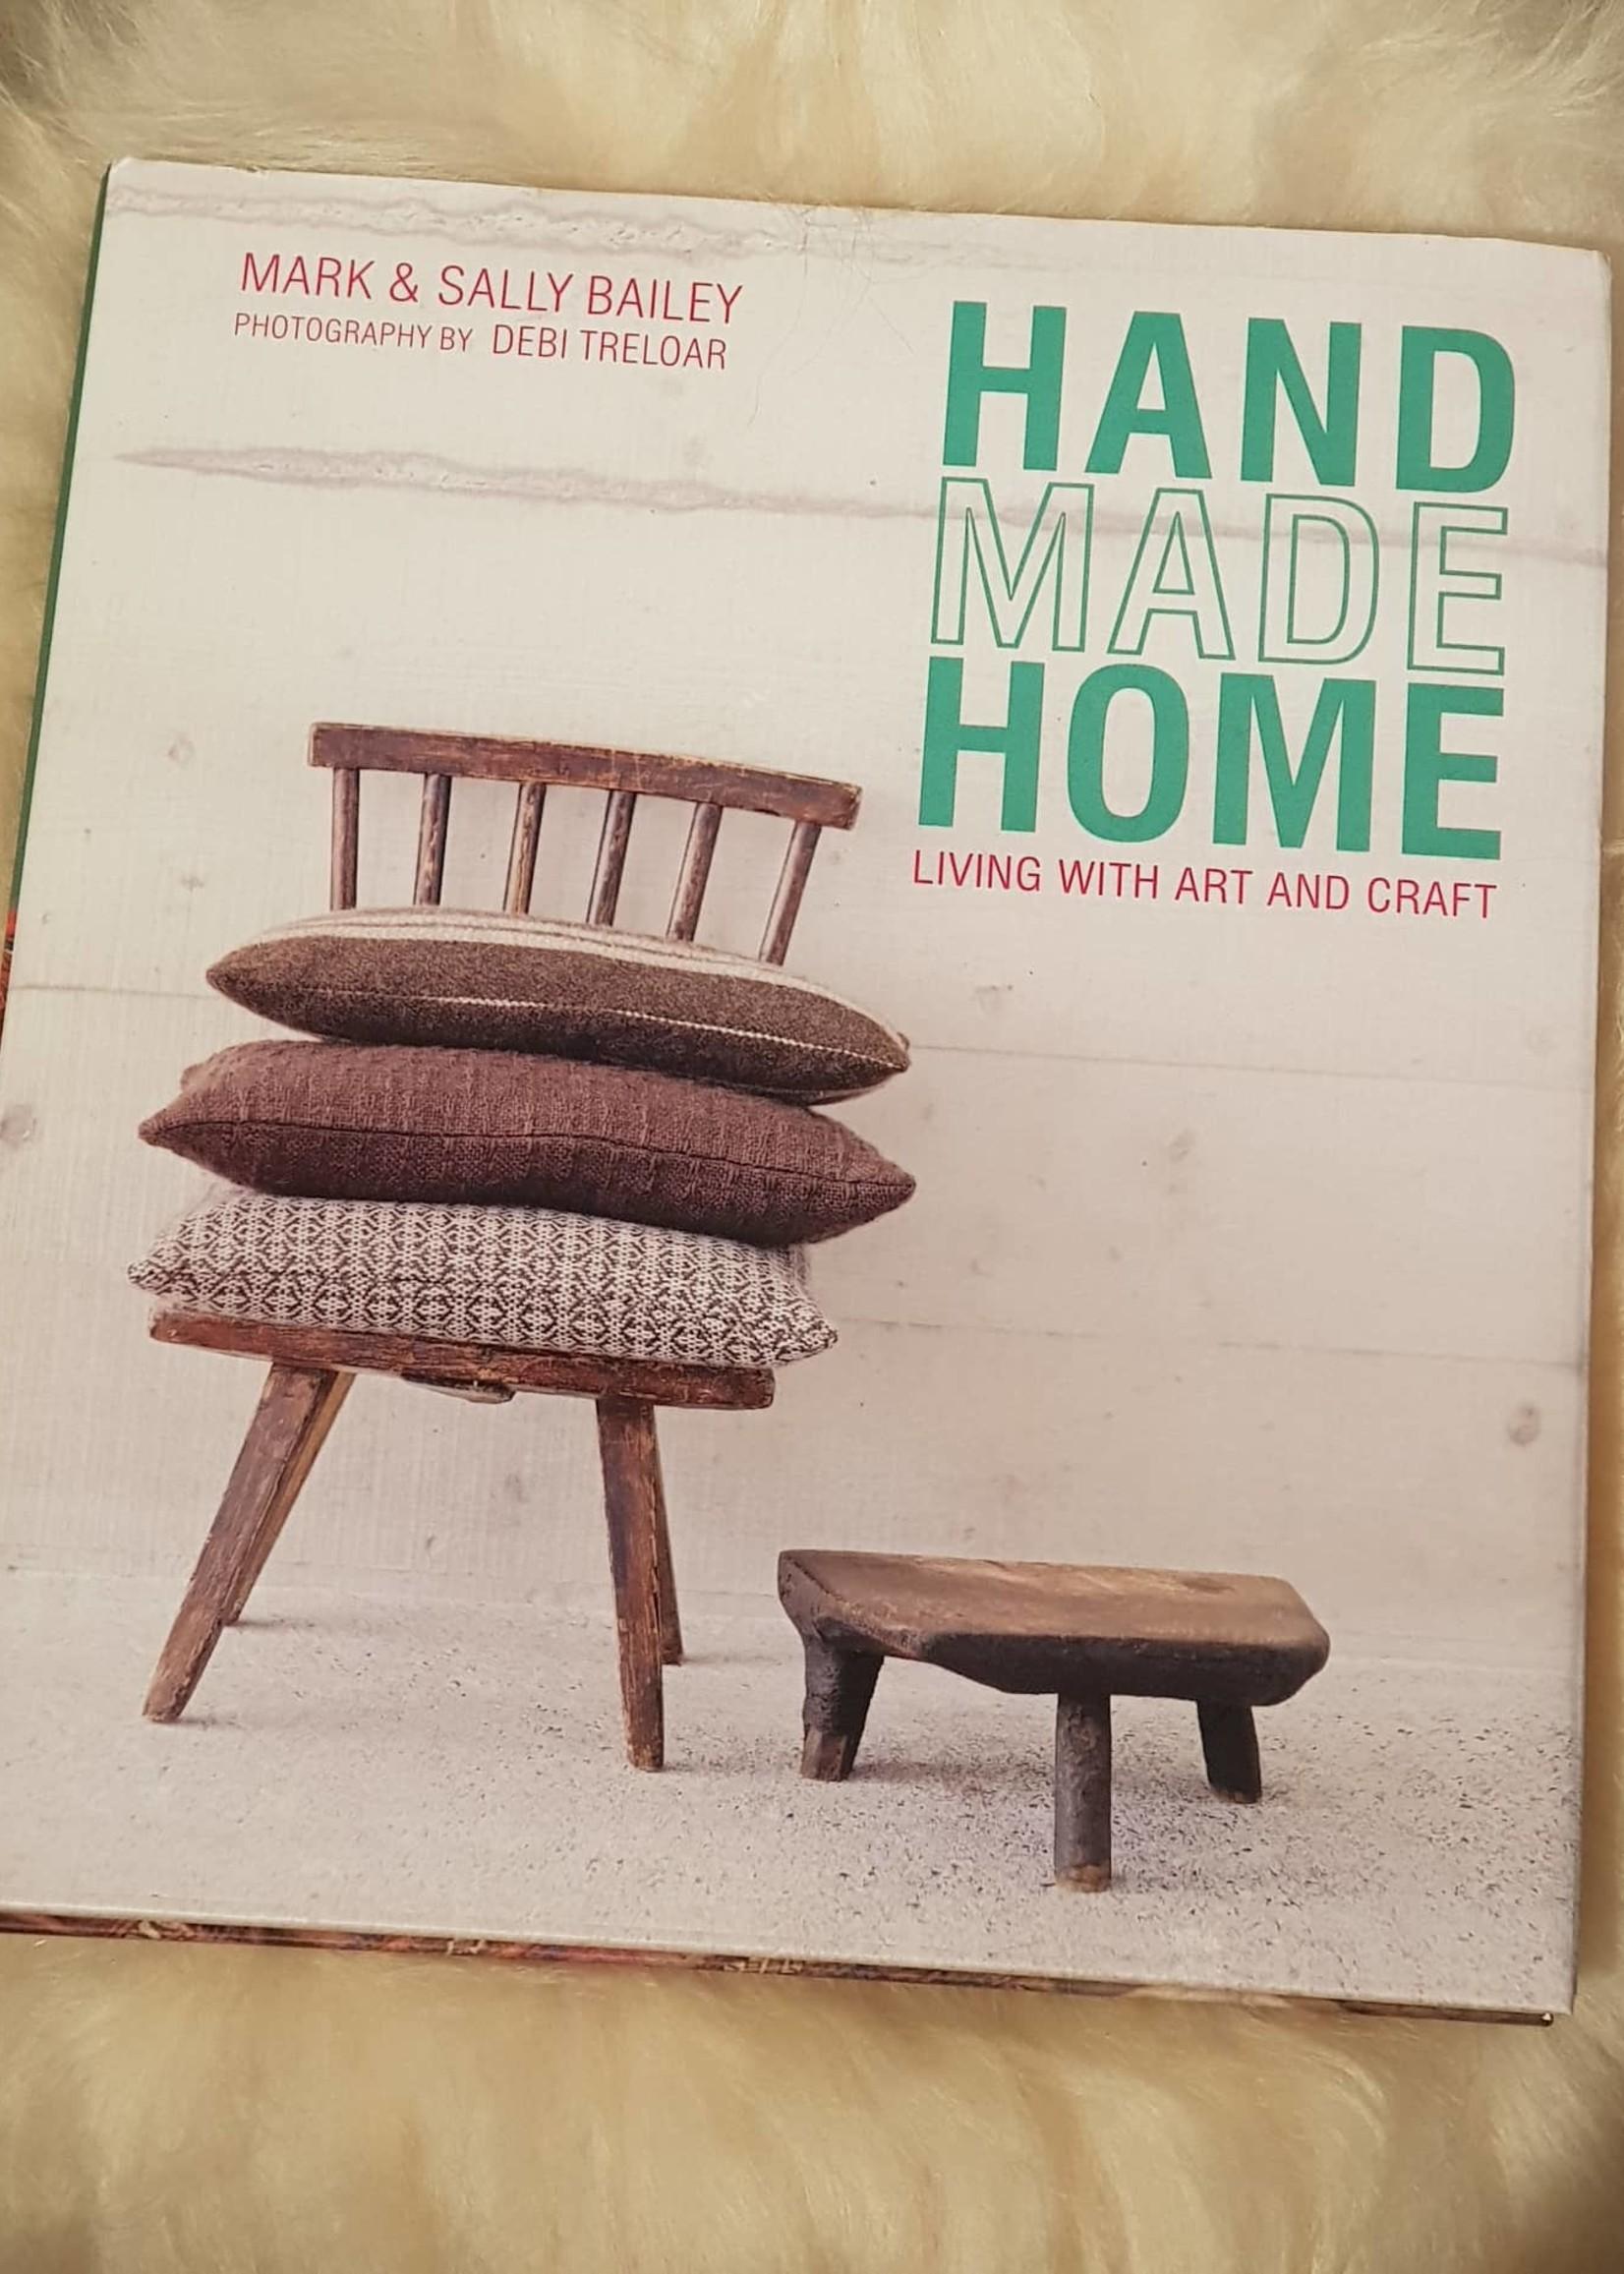 Boek Hand made home